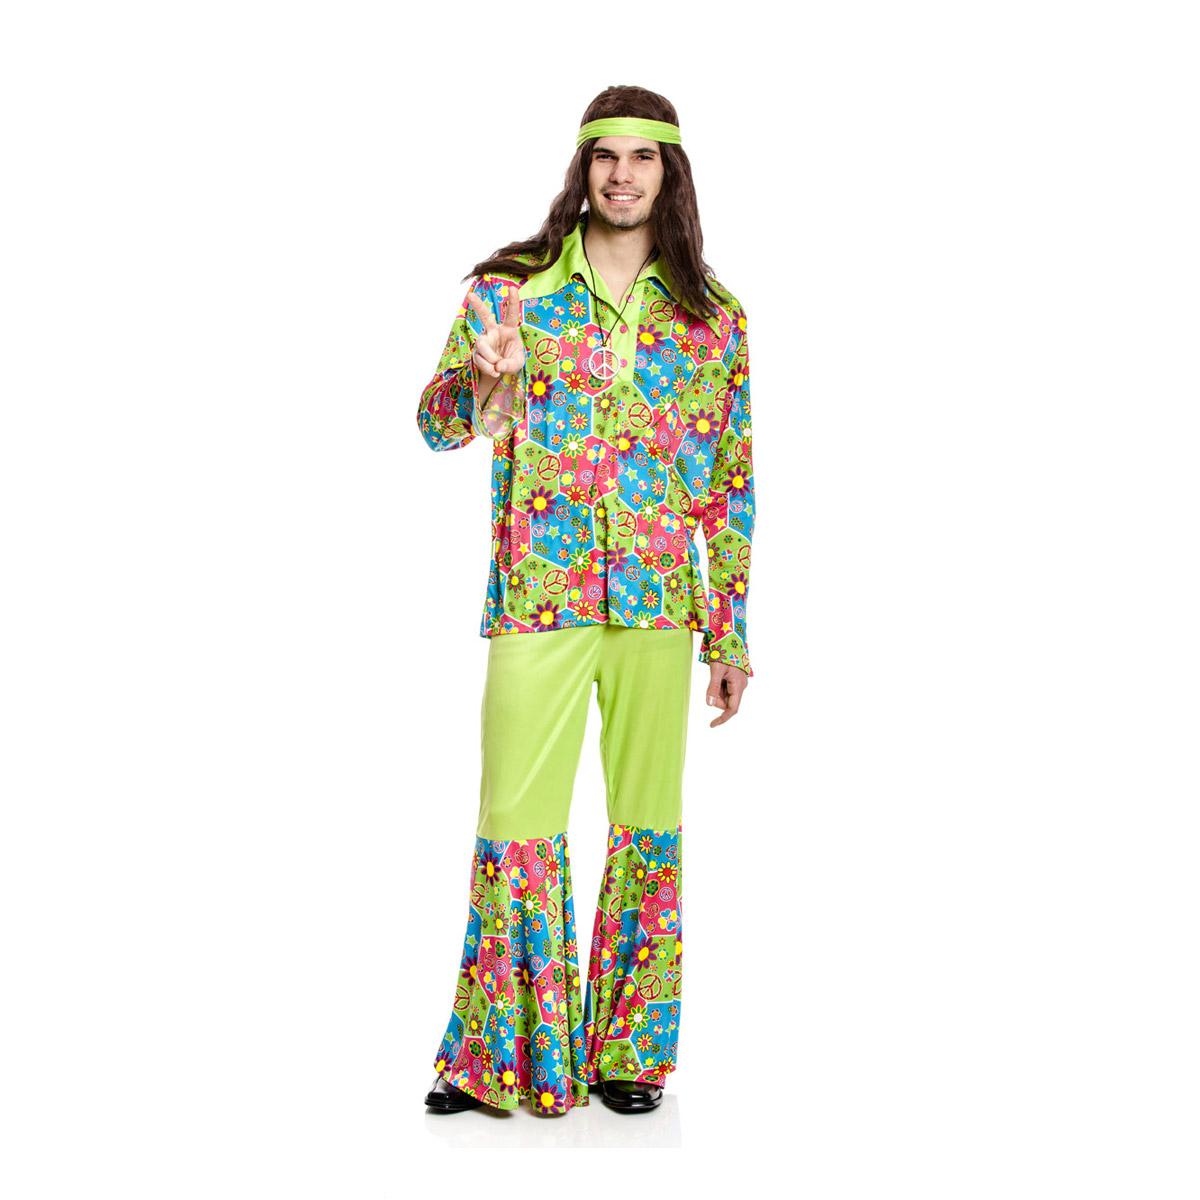 hippie kost m herren 60er jahre outfit flower power kost mplanet. Black Bedroom Furniture Sets. Home Design Ideas